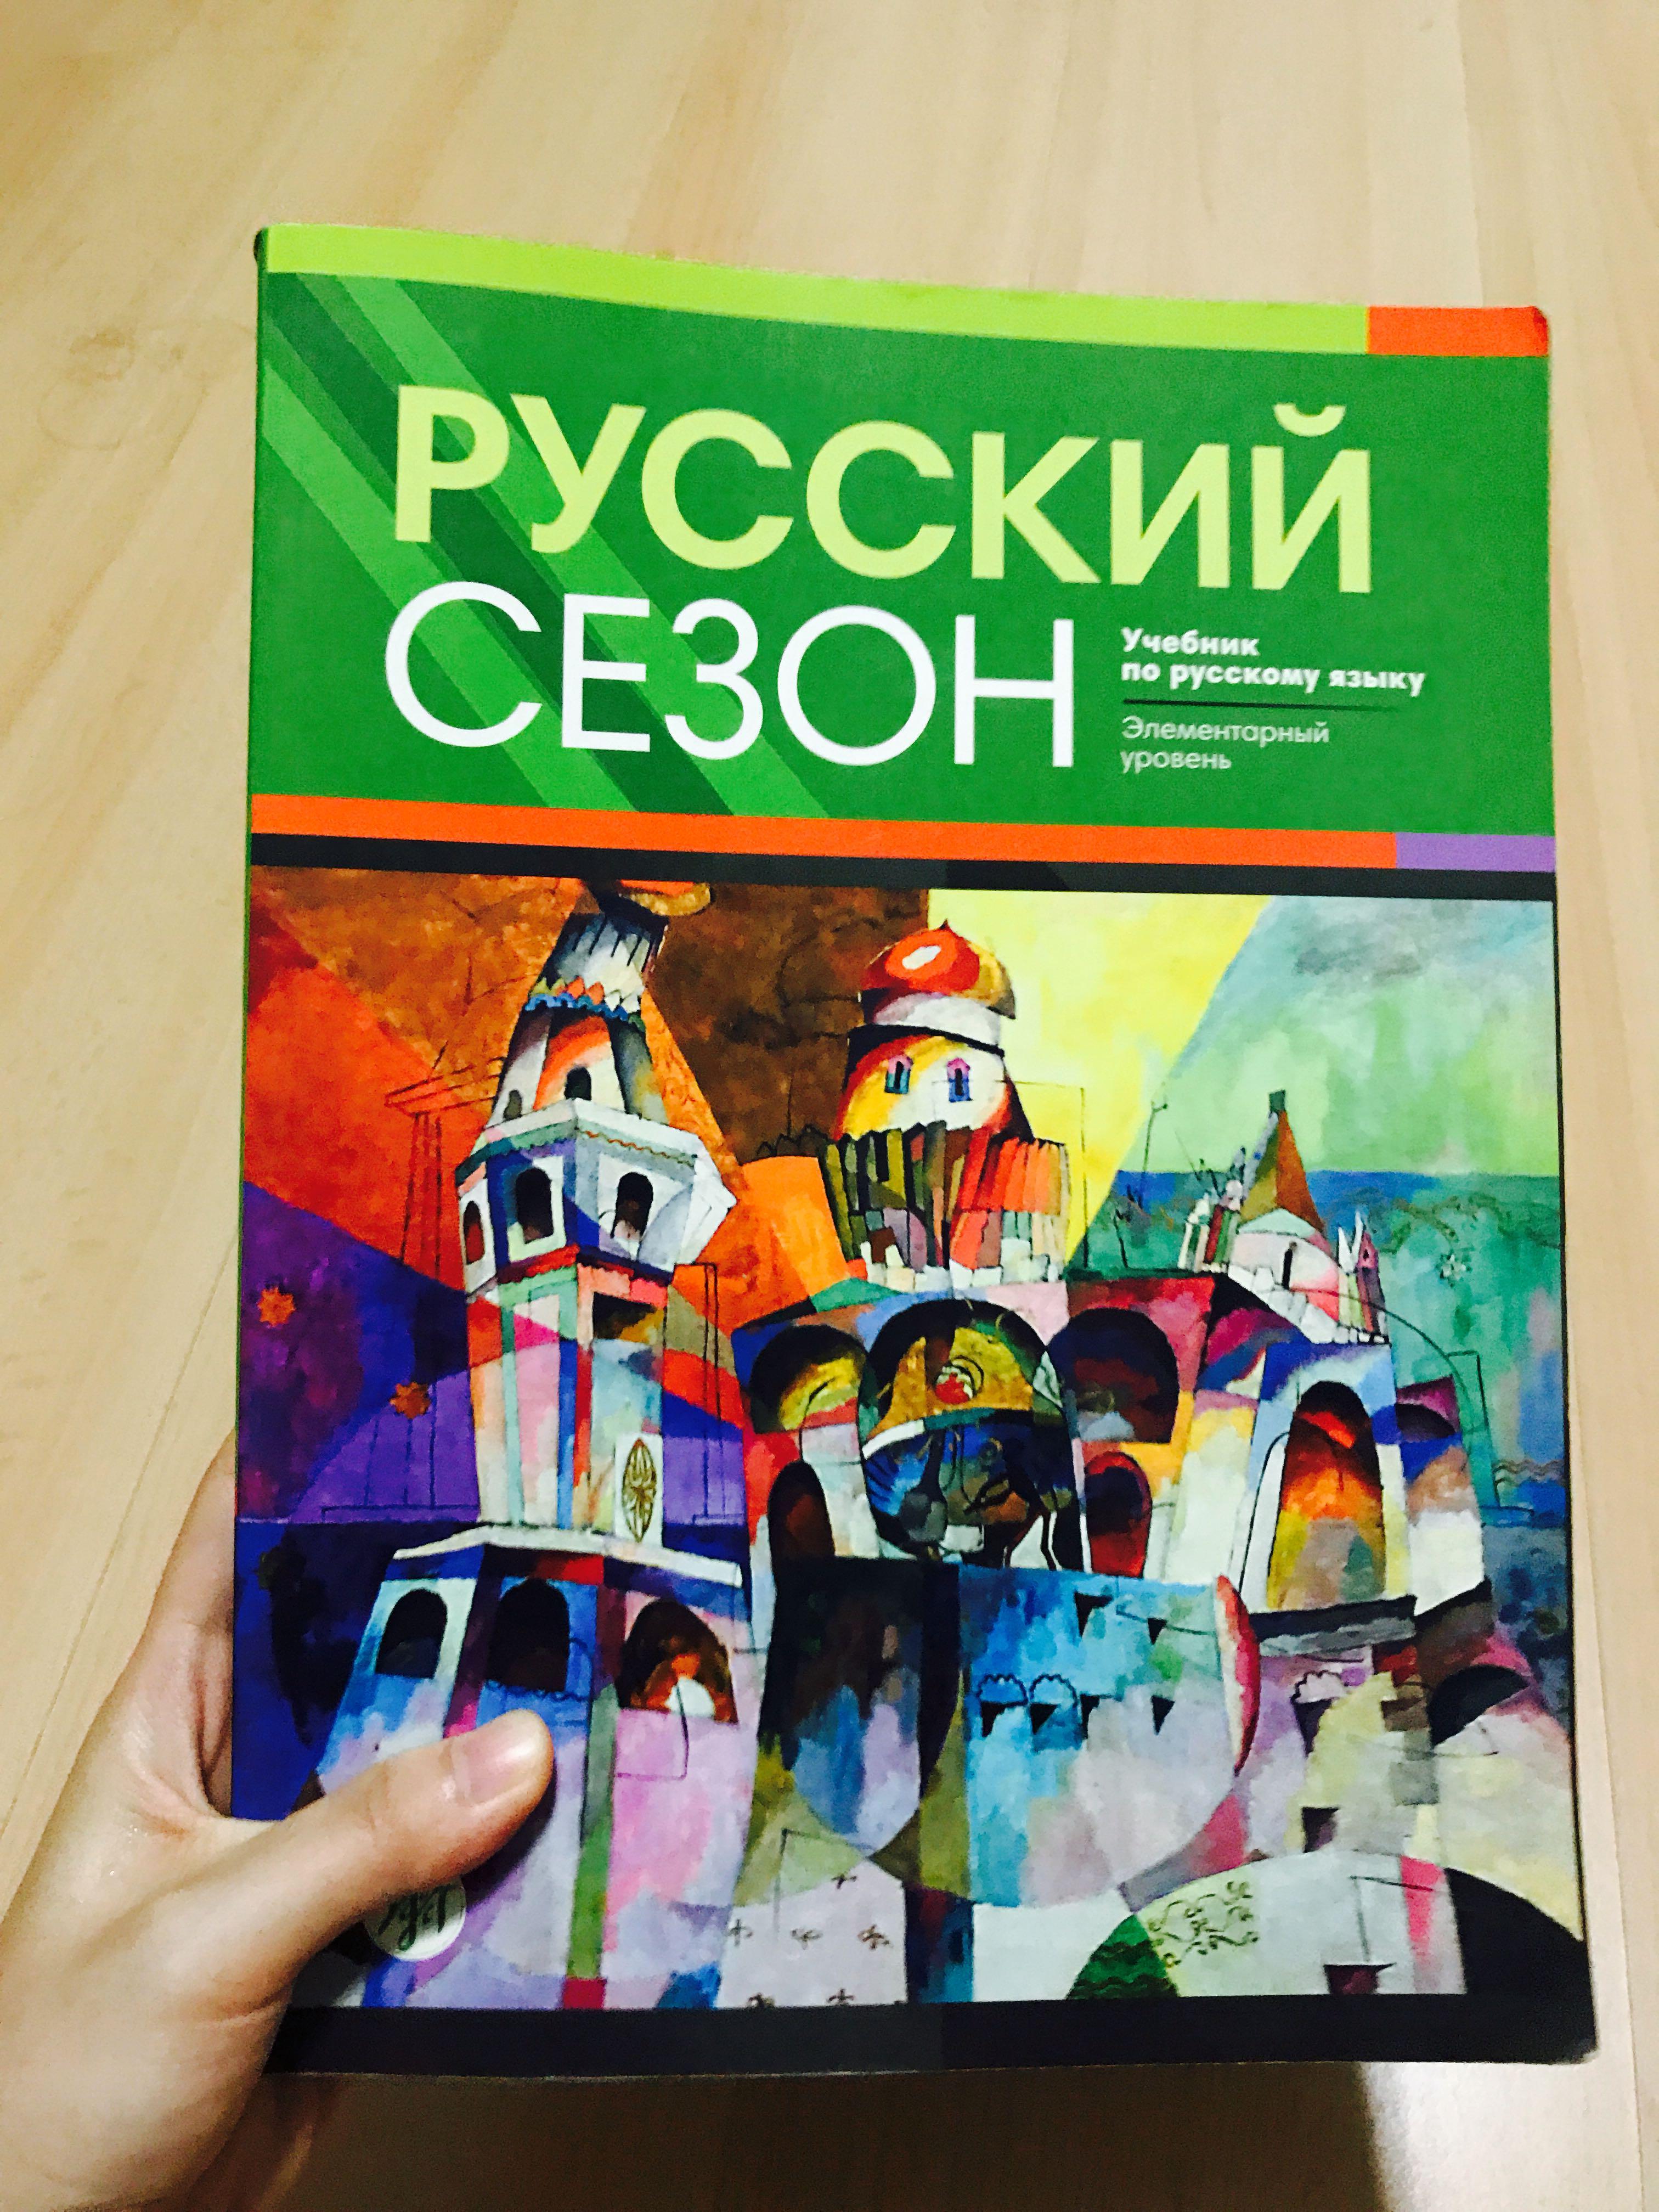 NTU LR9001 RUSSIAN LEVEL 1 Textbook, Books & Stationery